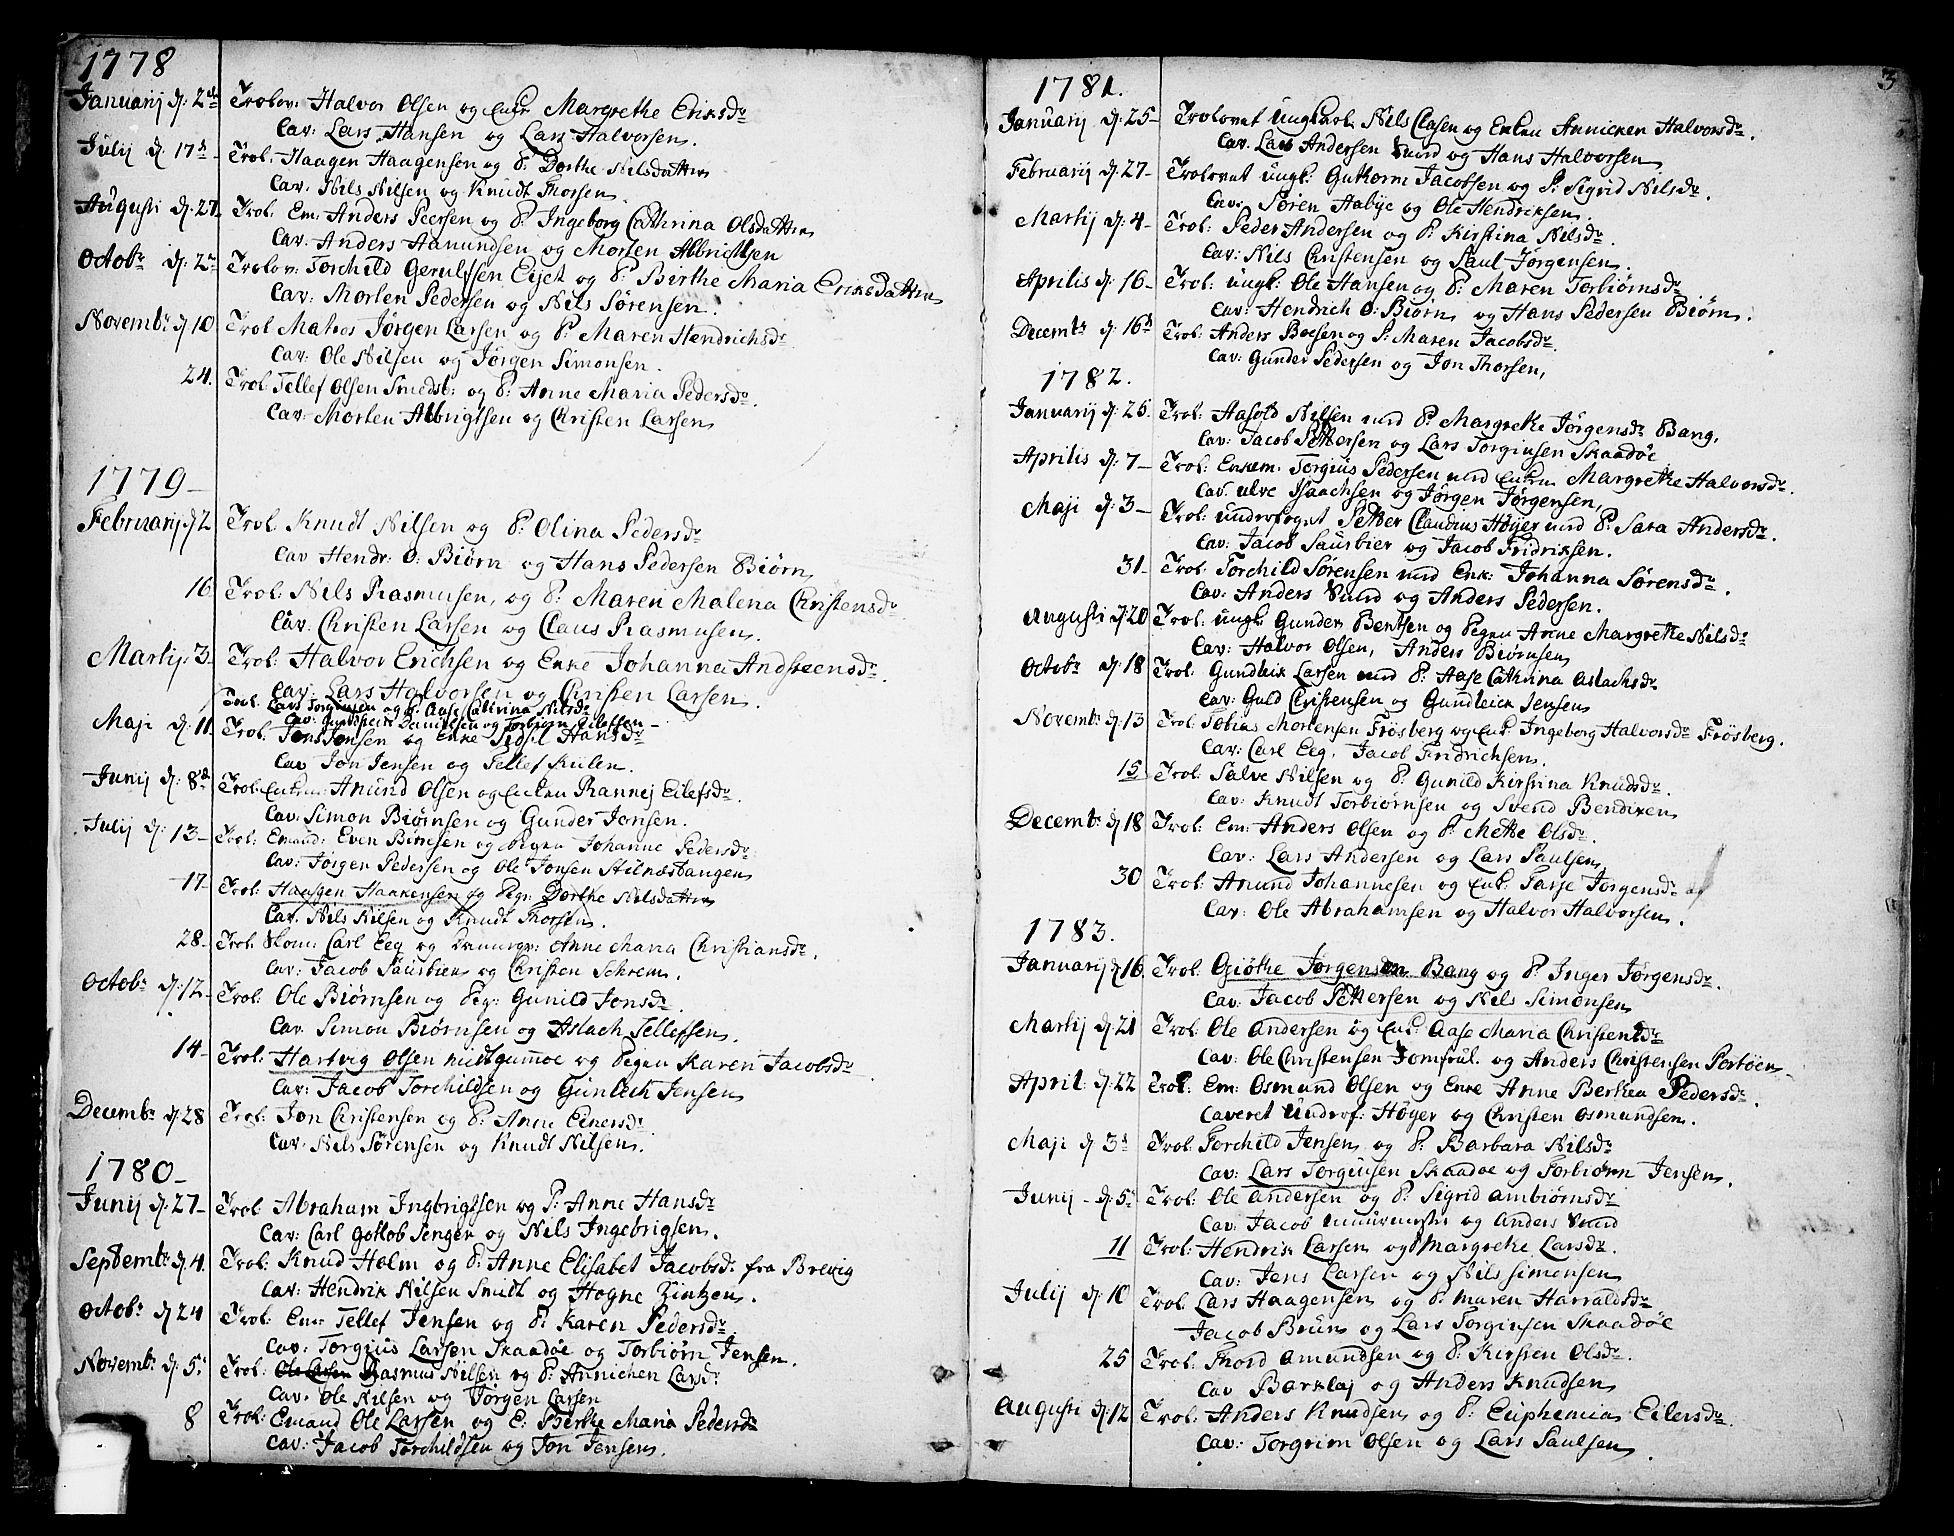 SAKO, Kragerø kirkebøker, F/Fa/L0002: Ministerialbok nr. 2, 1767-1802, s. 3